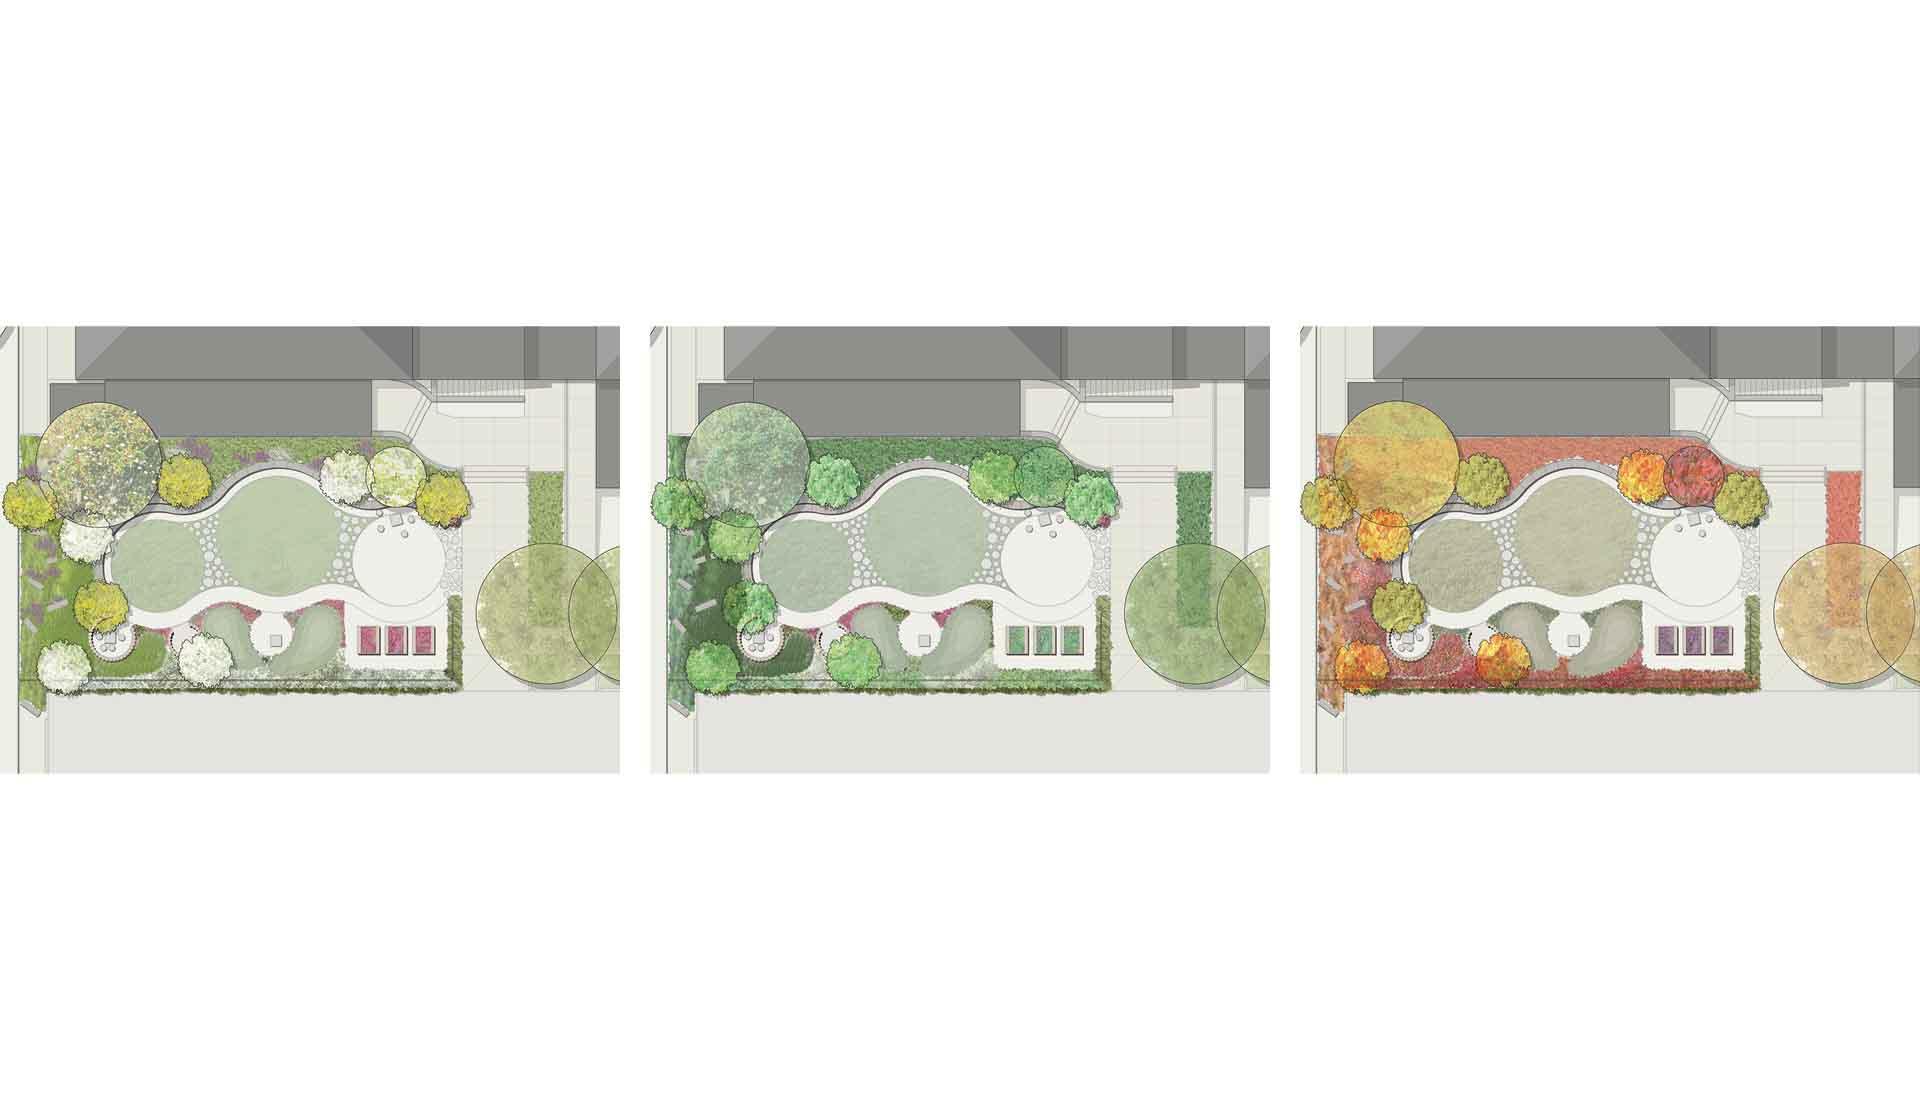 Arbolope Studio   Landscape Architects + Urban Designers   Jubilee Garden Playscape